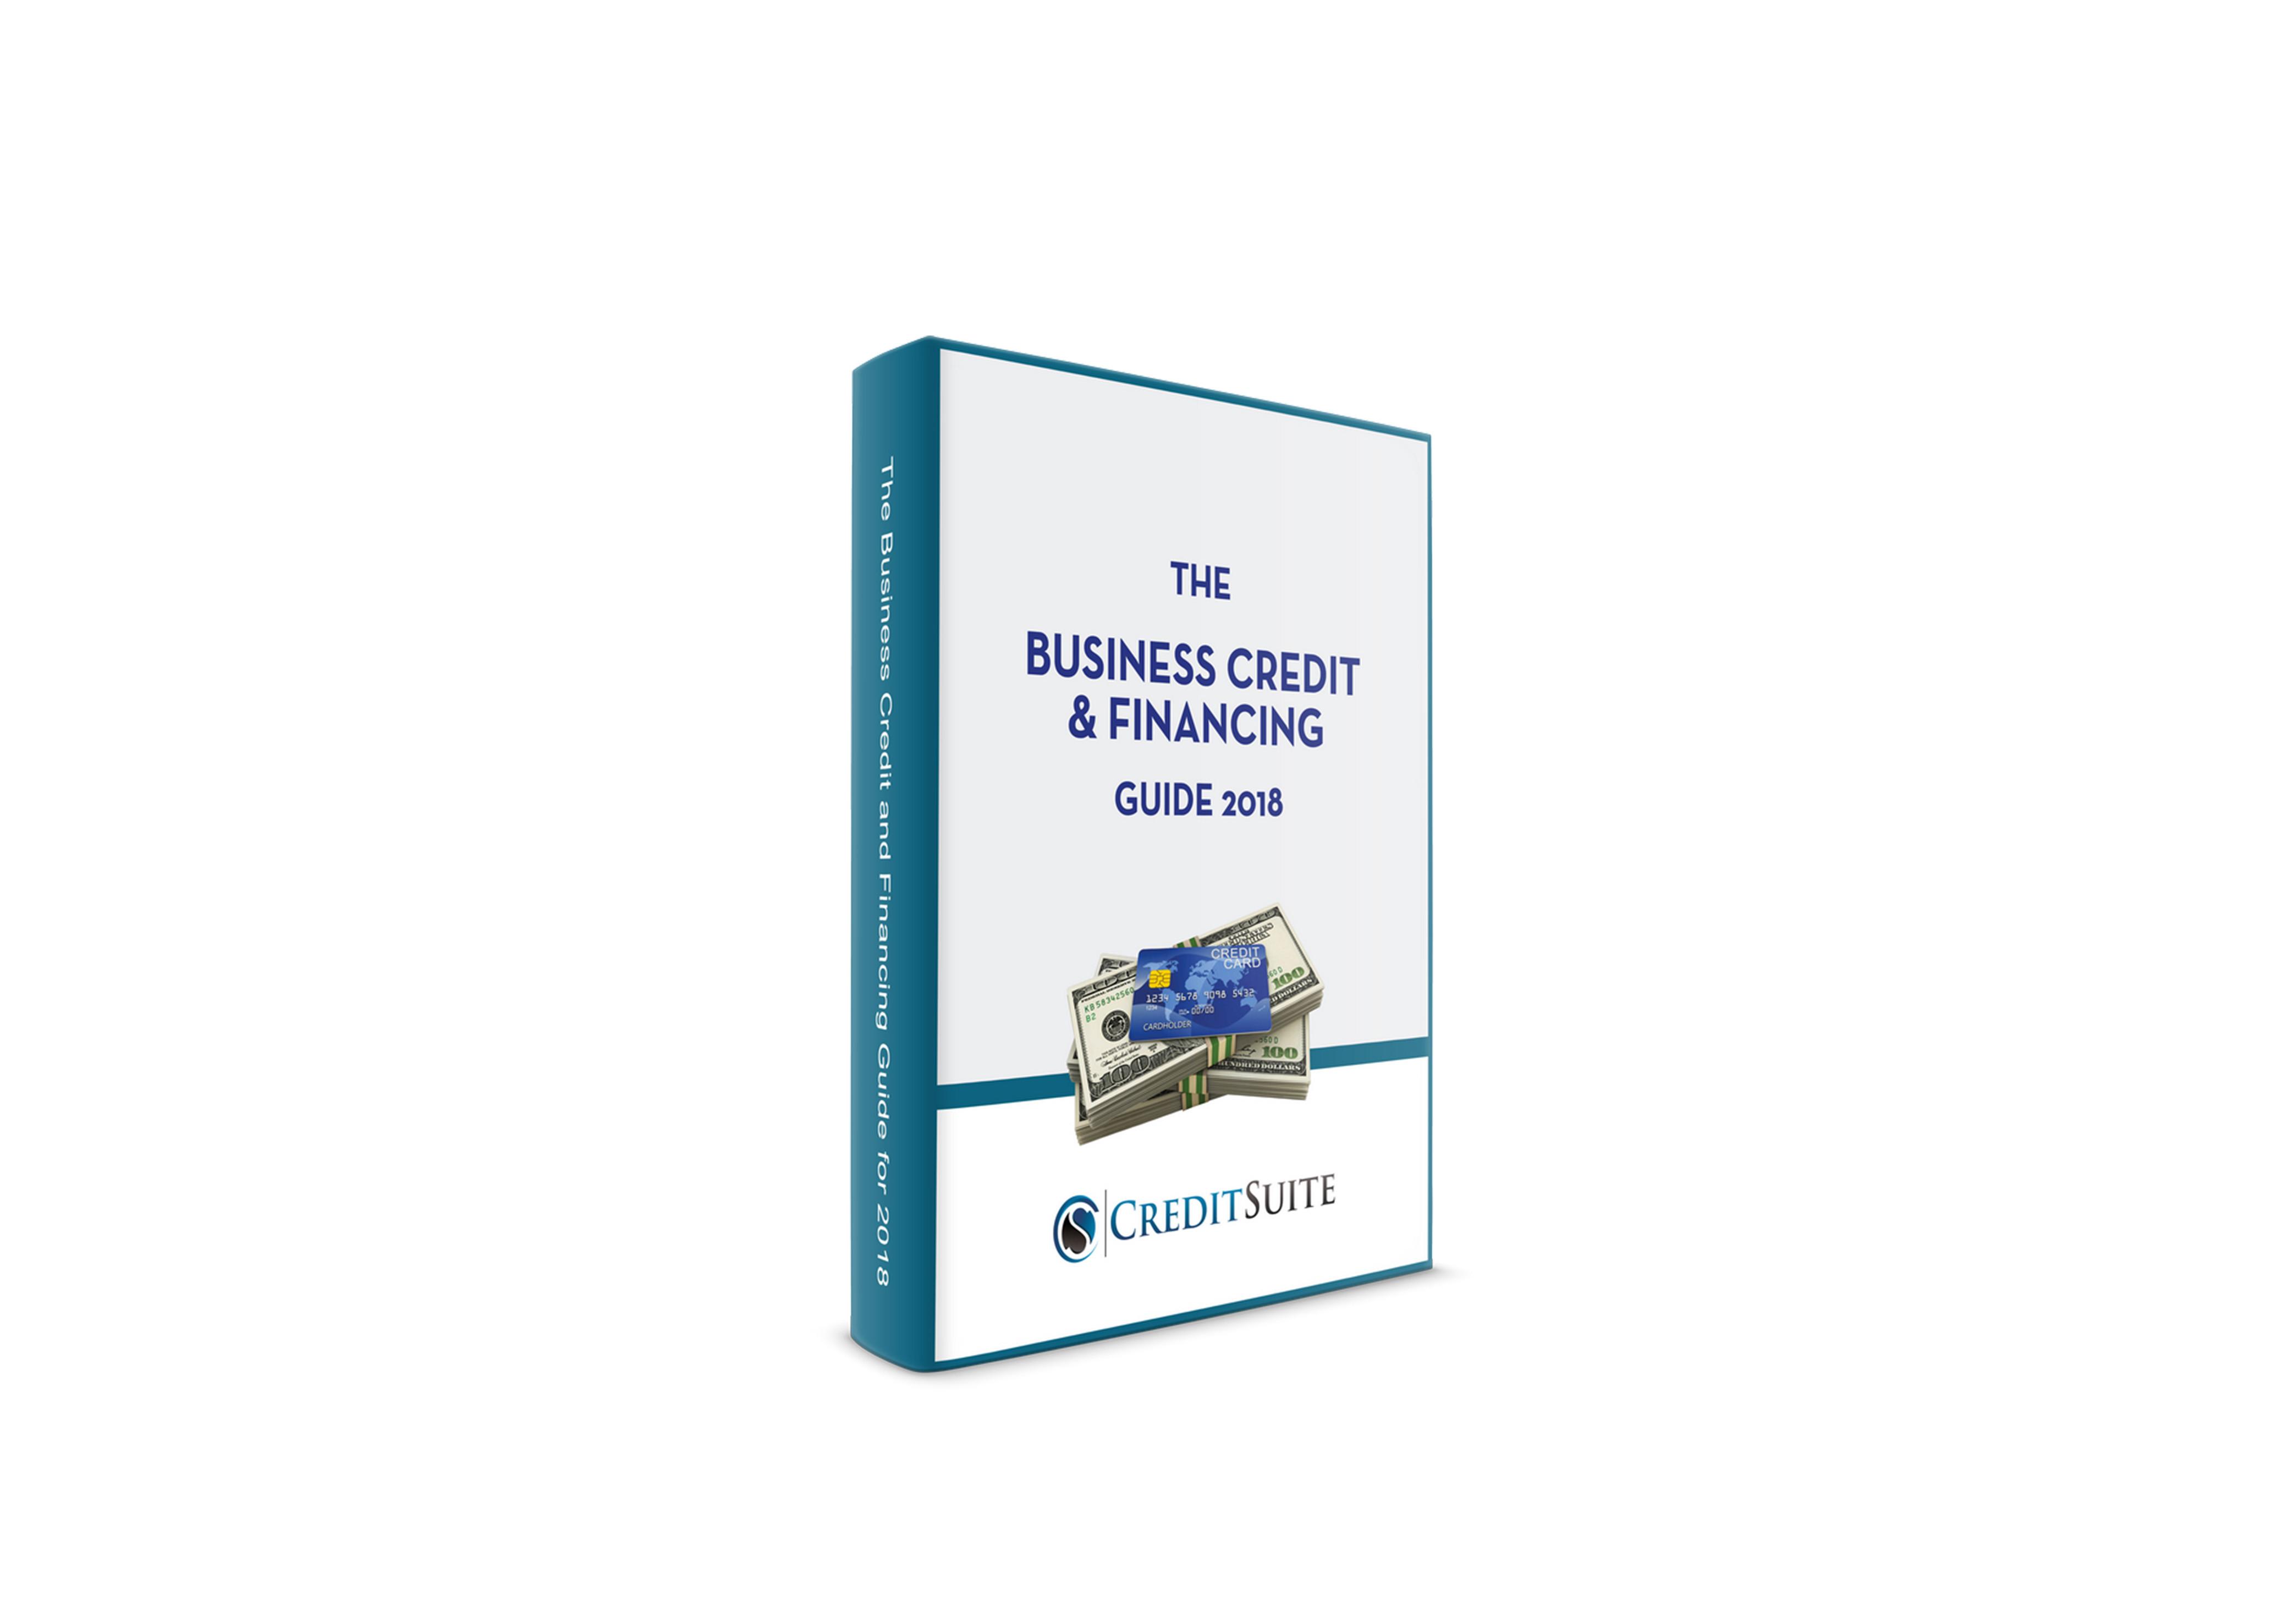 Business Credit & Financing